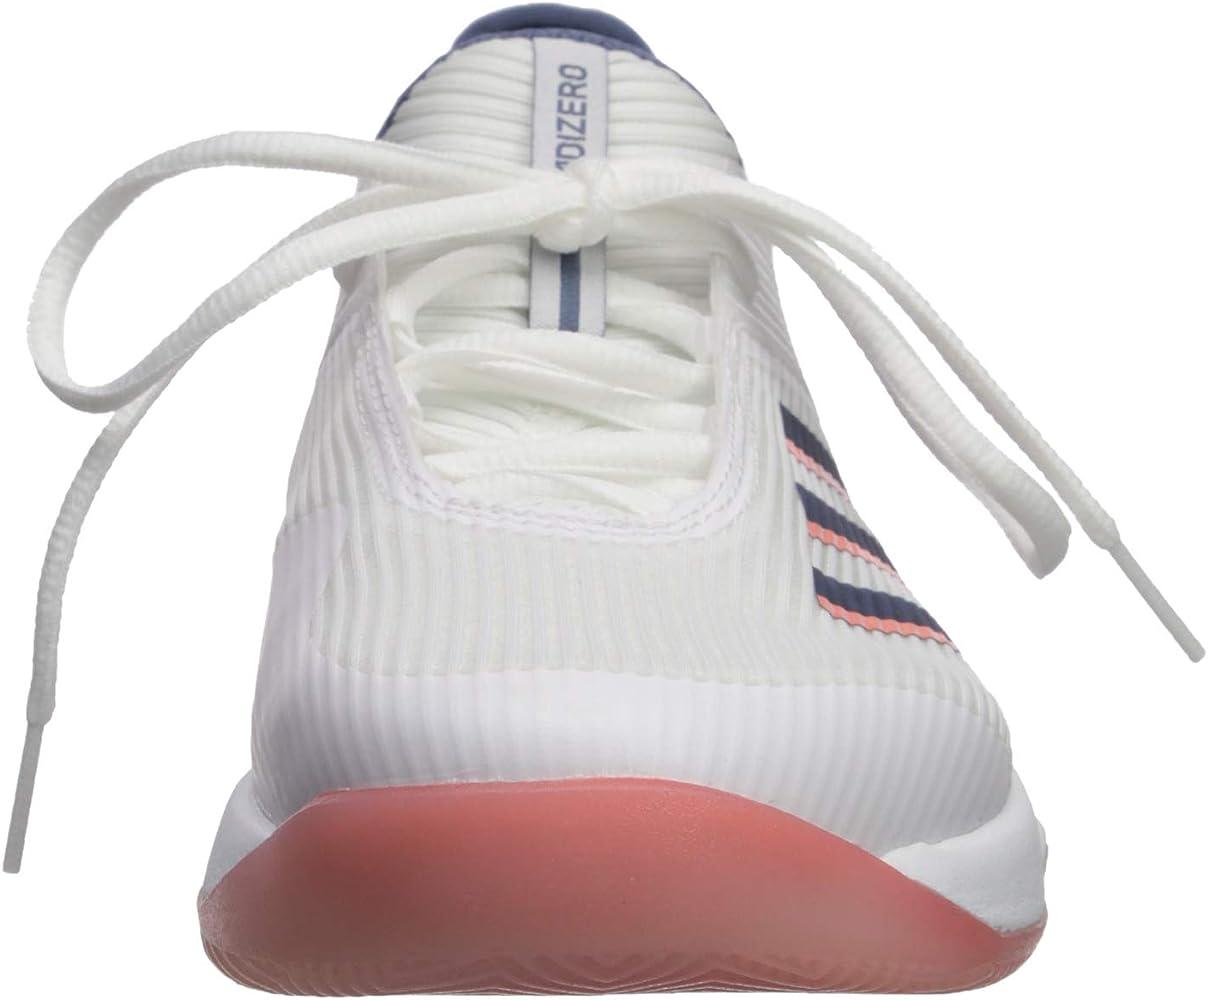 adidas scarpe da ginnastica with lace cut out sides